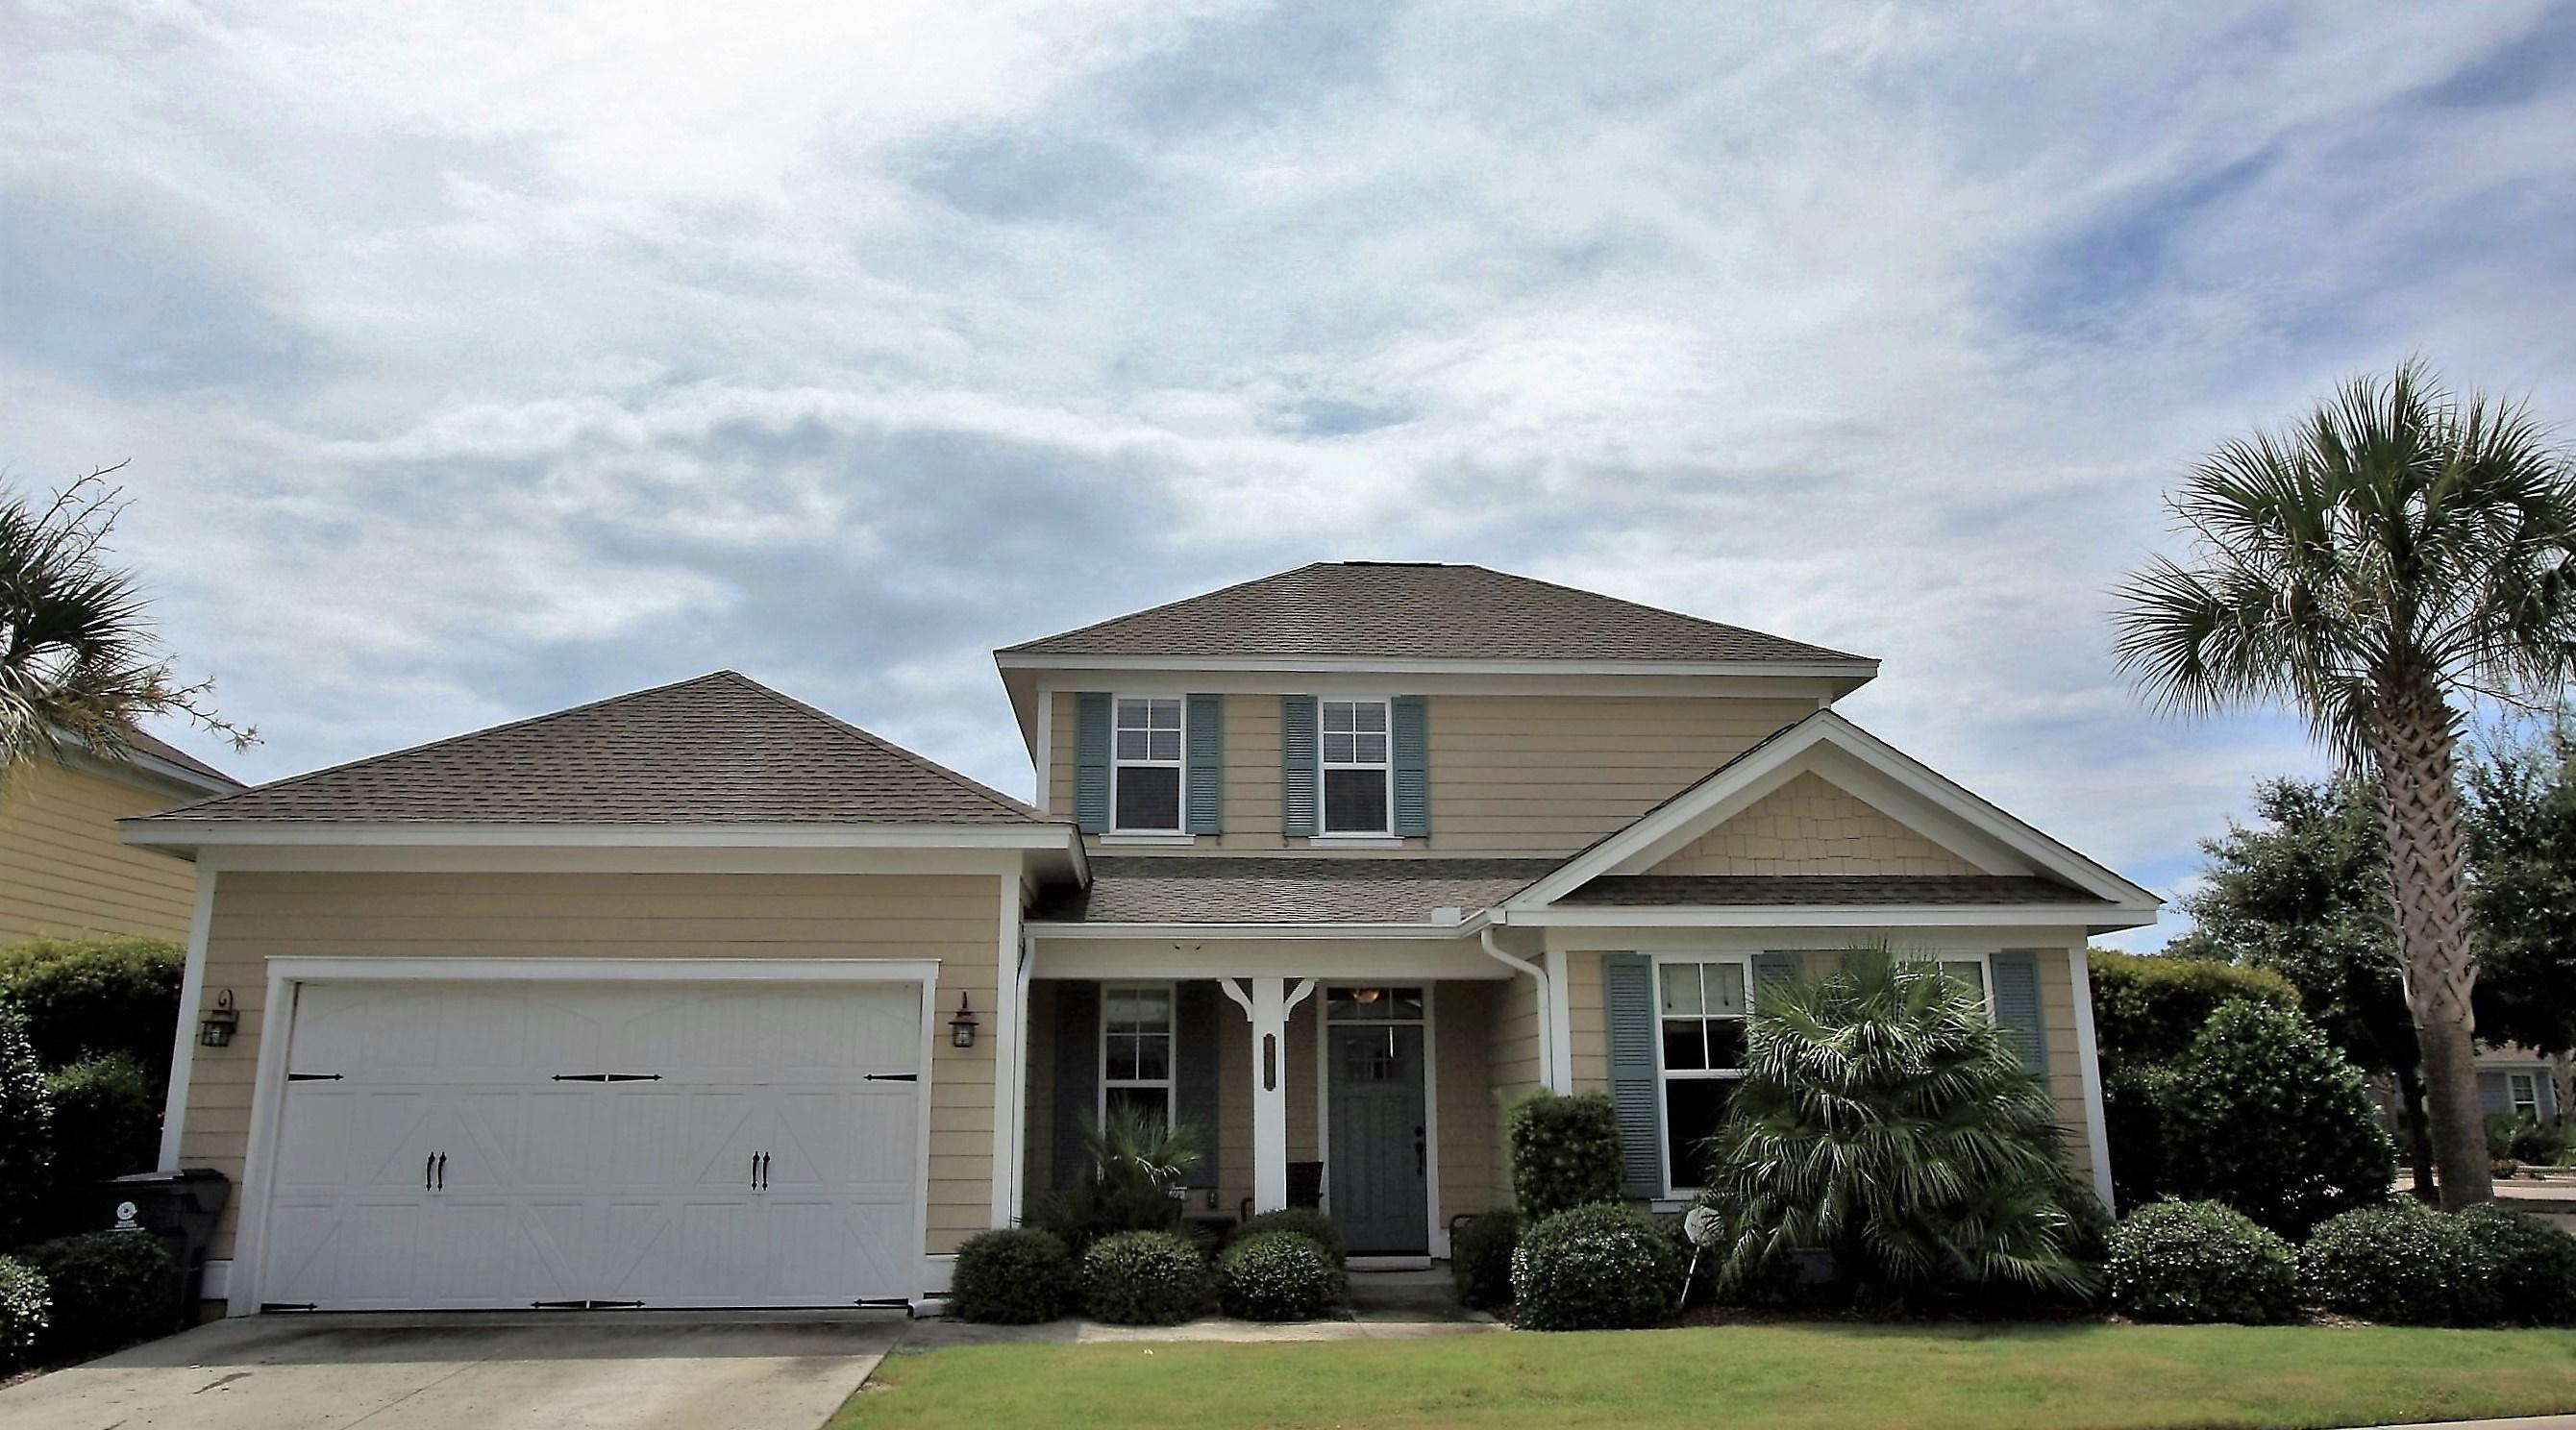 Fullsize Of Plantation Homes For Sale